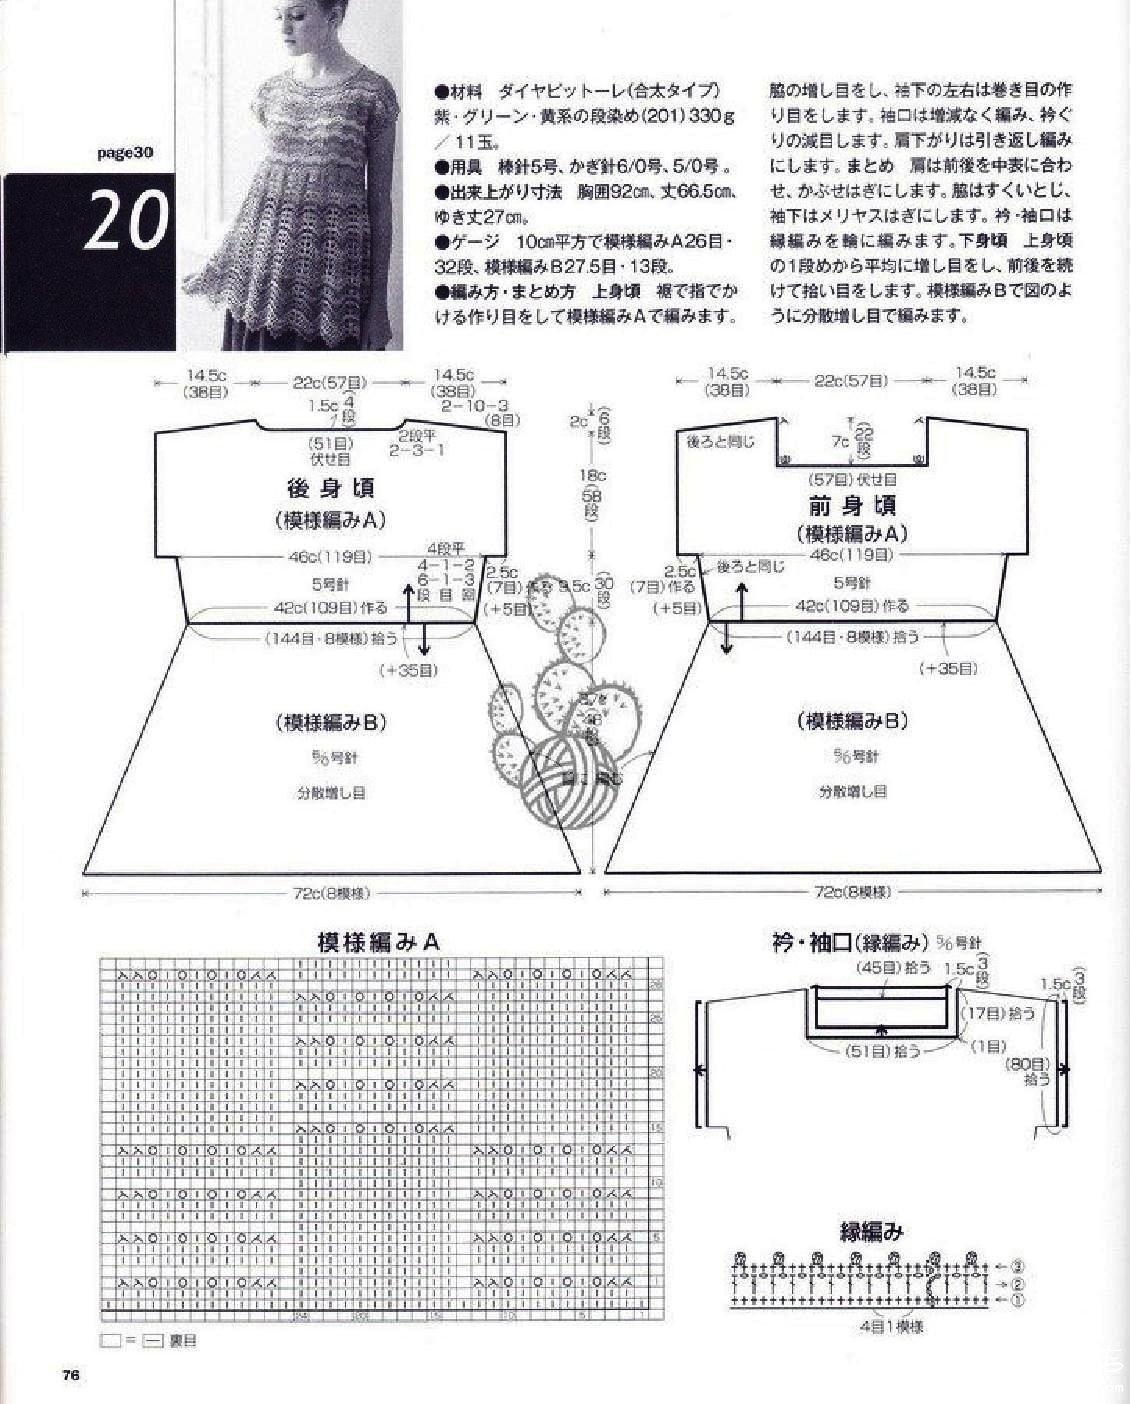 NV80258_page76_image1.jpg